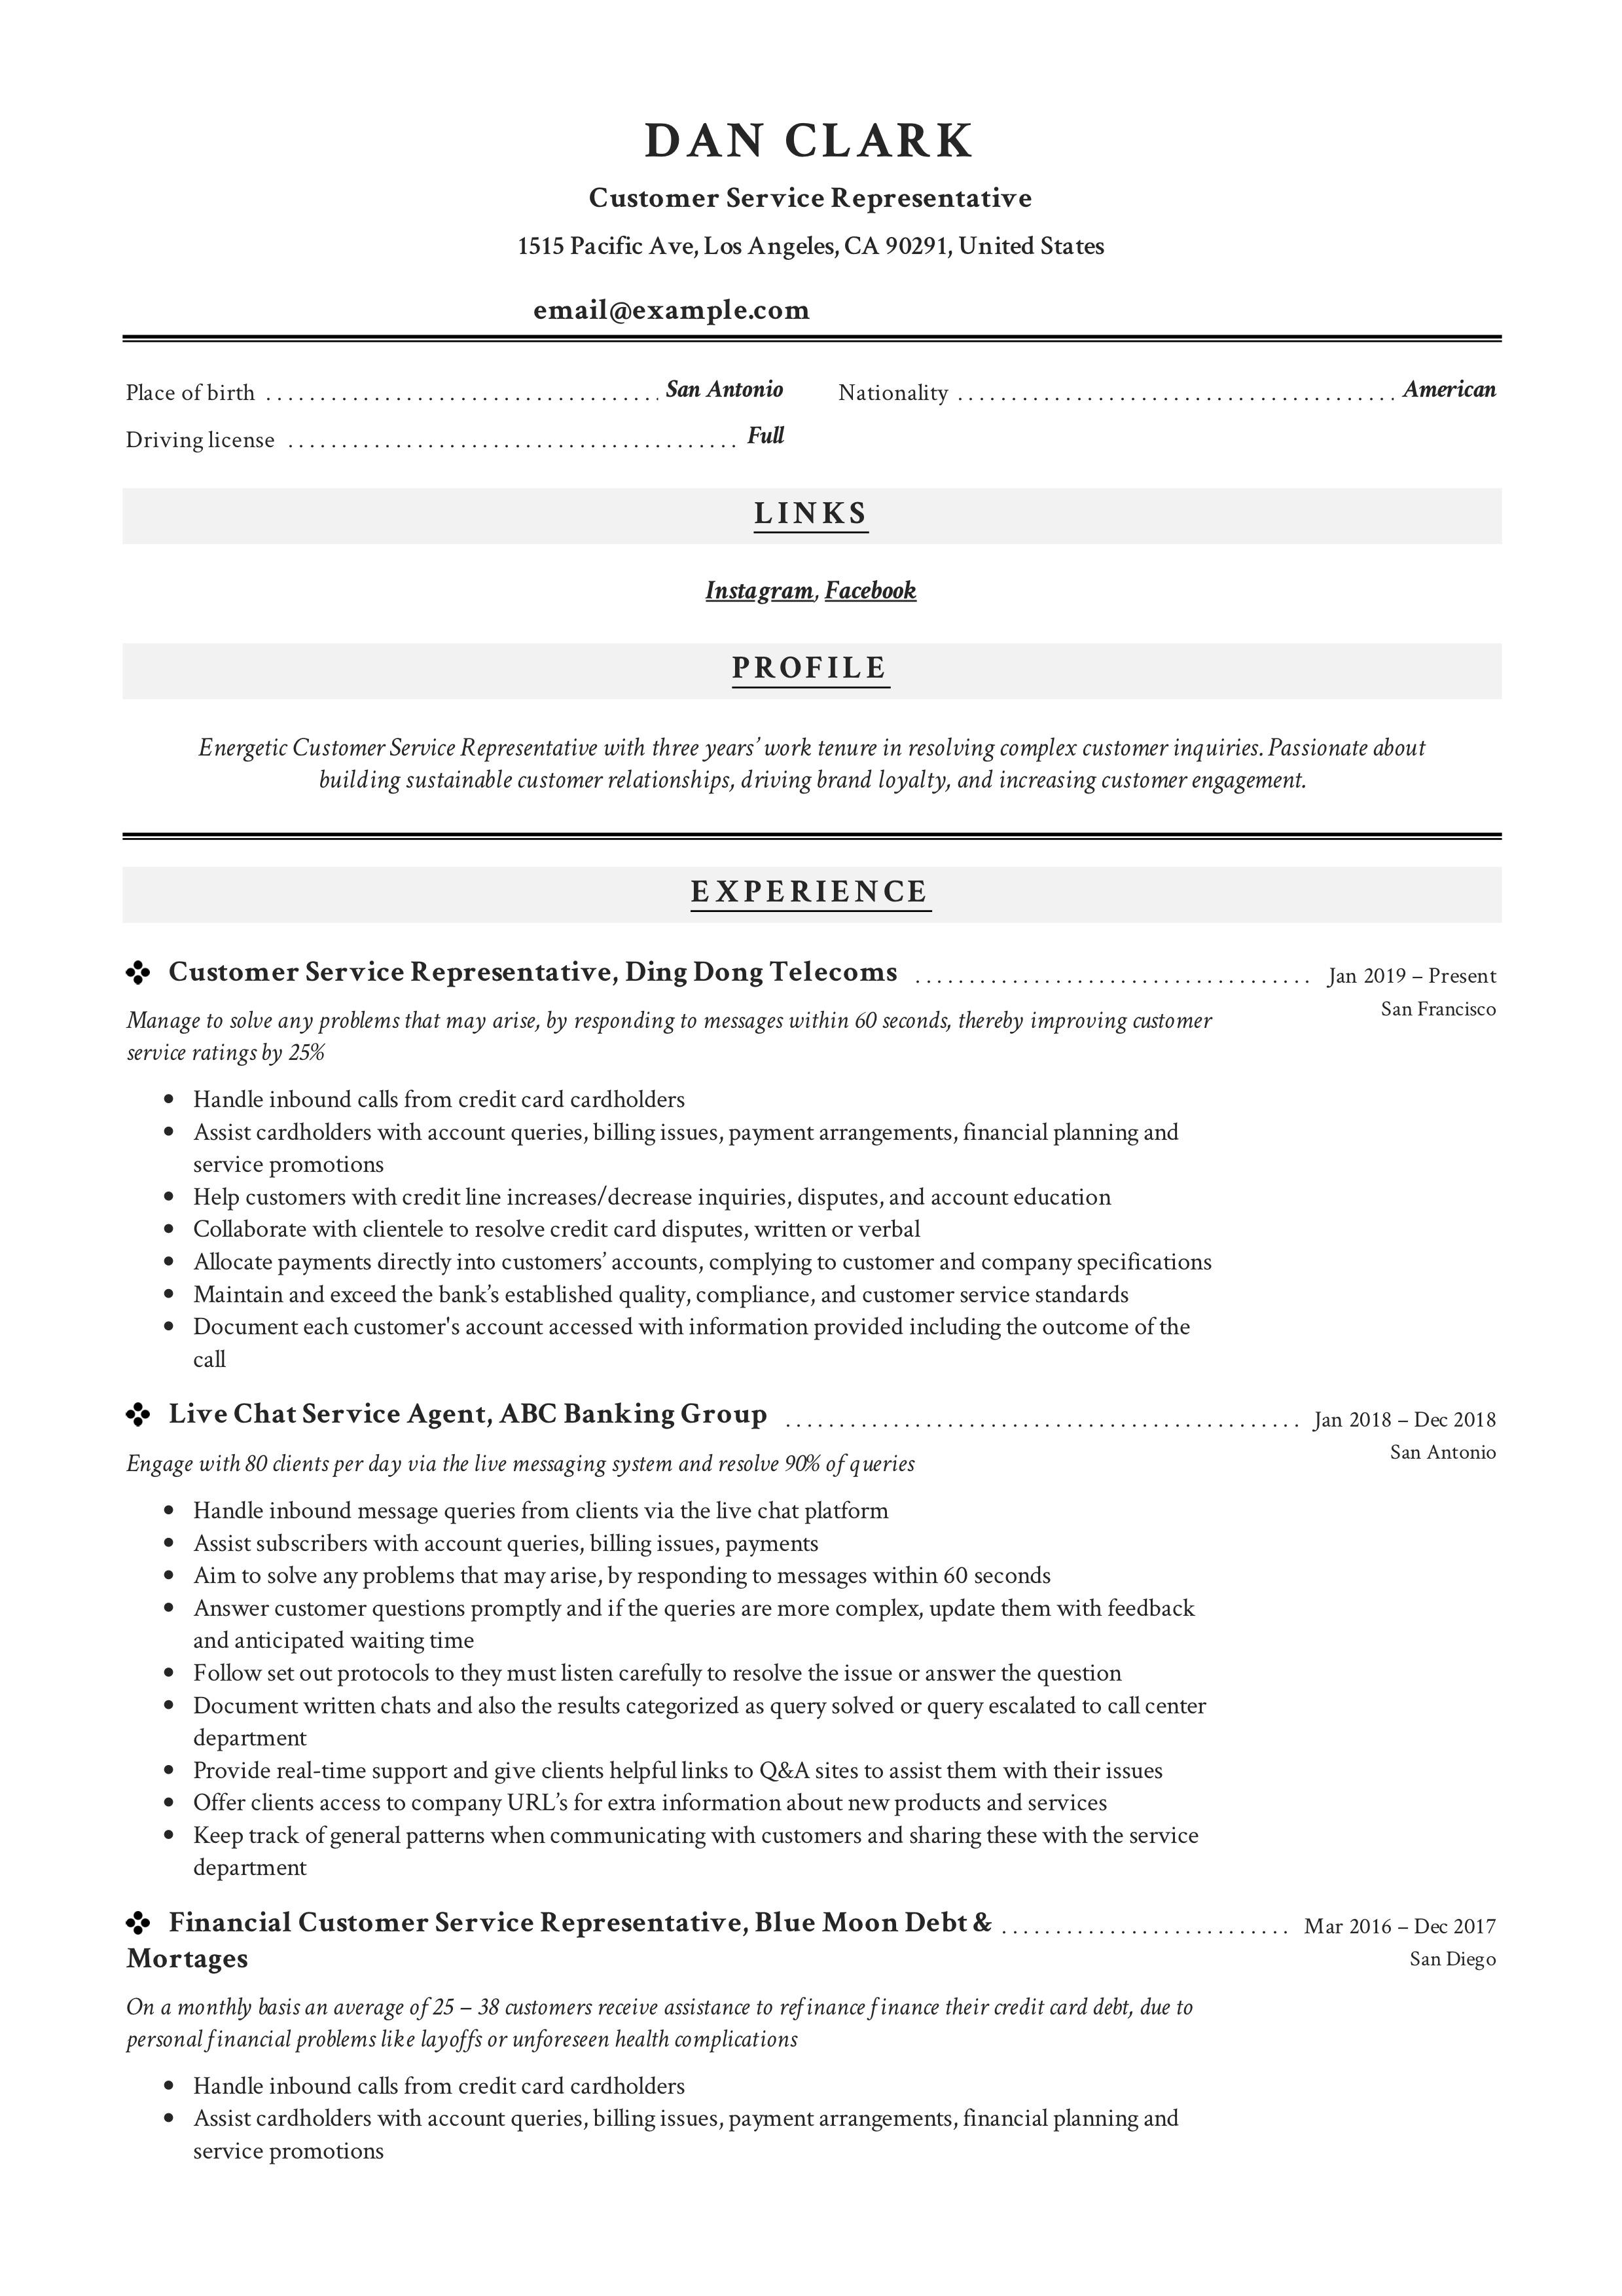 customer service summary for resume